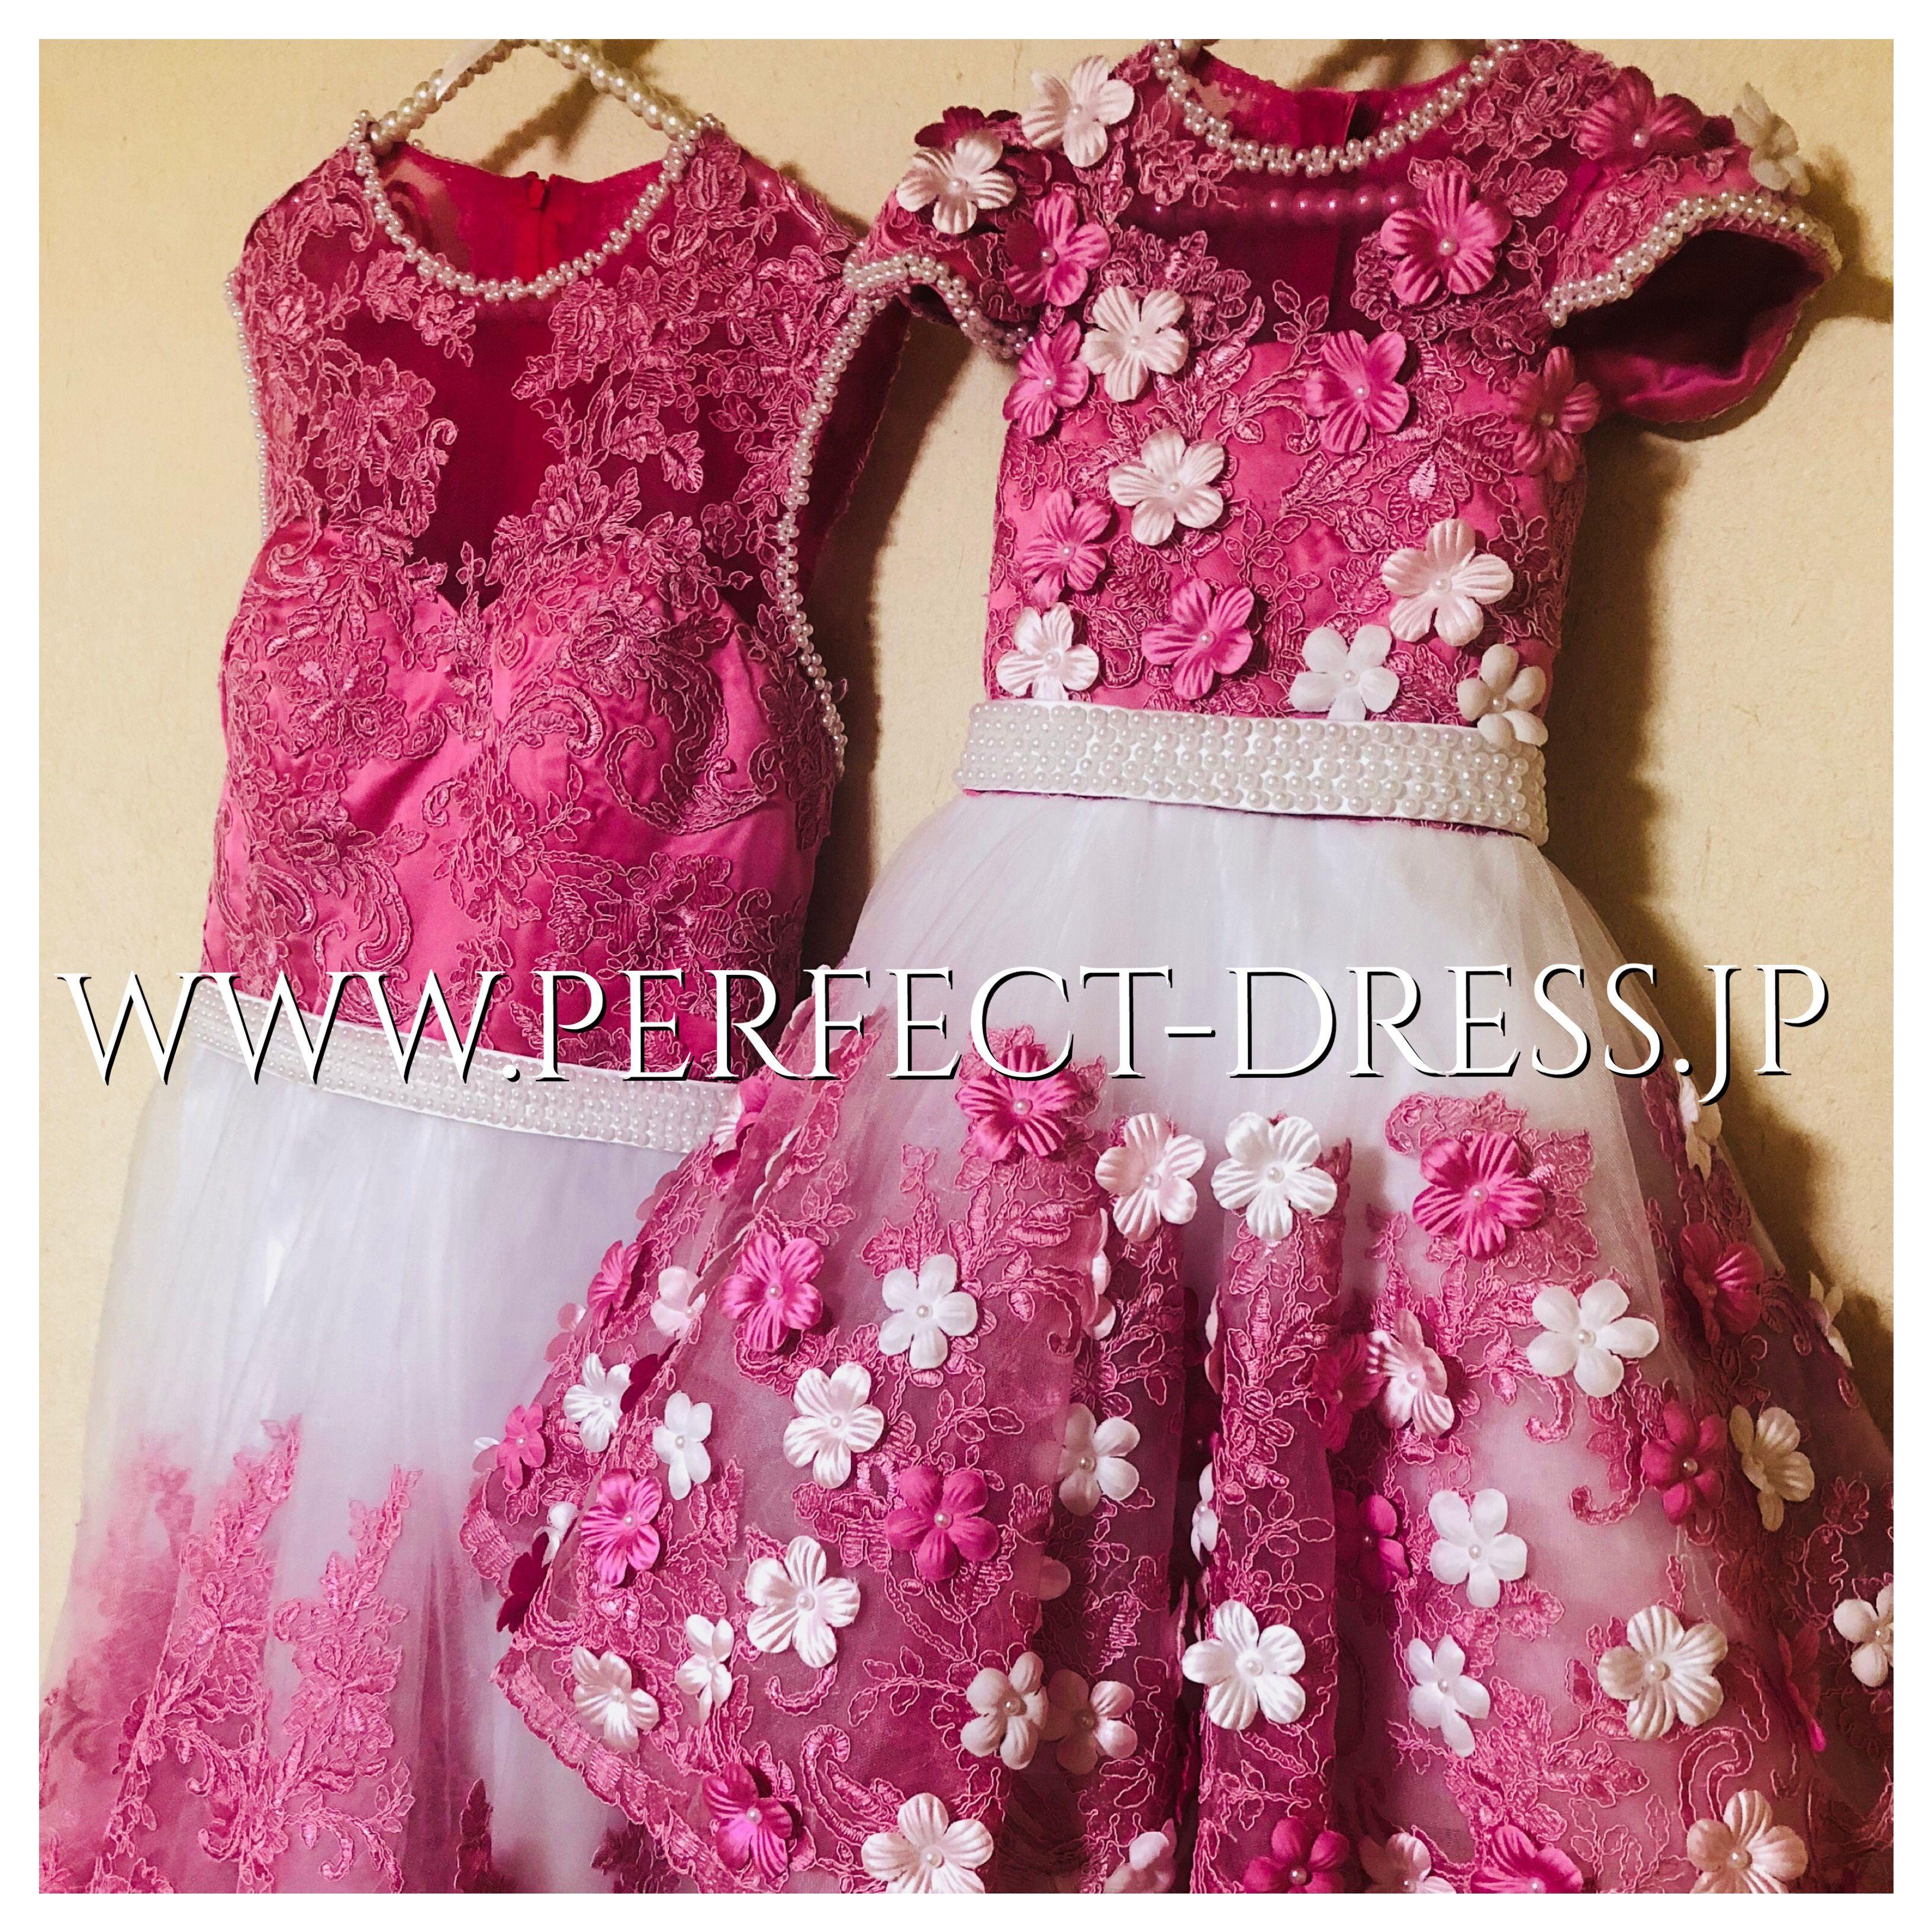 Vestido mamãe e bebê acesse rfectdress vestidodefesta